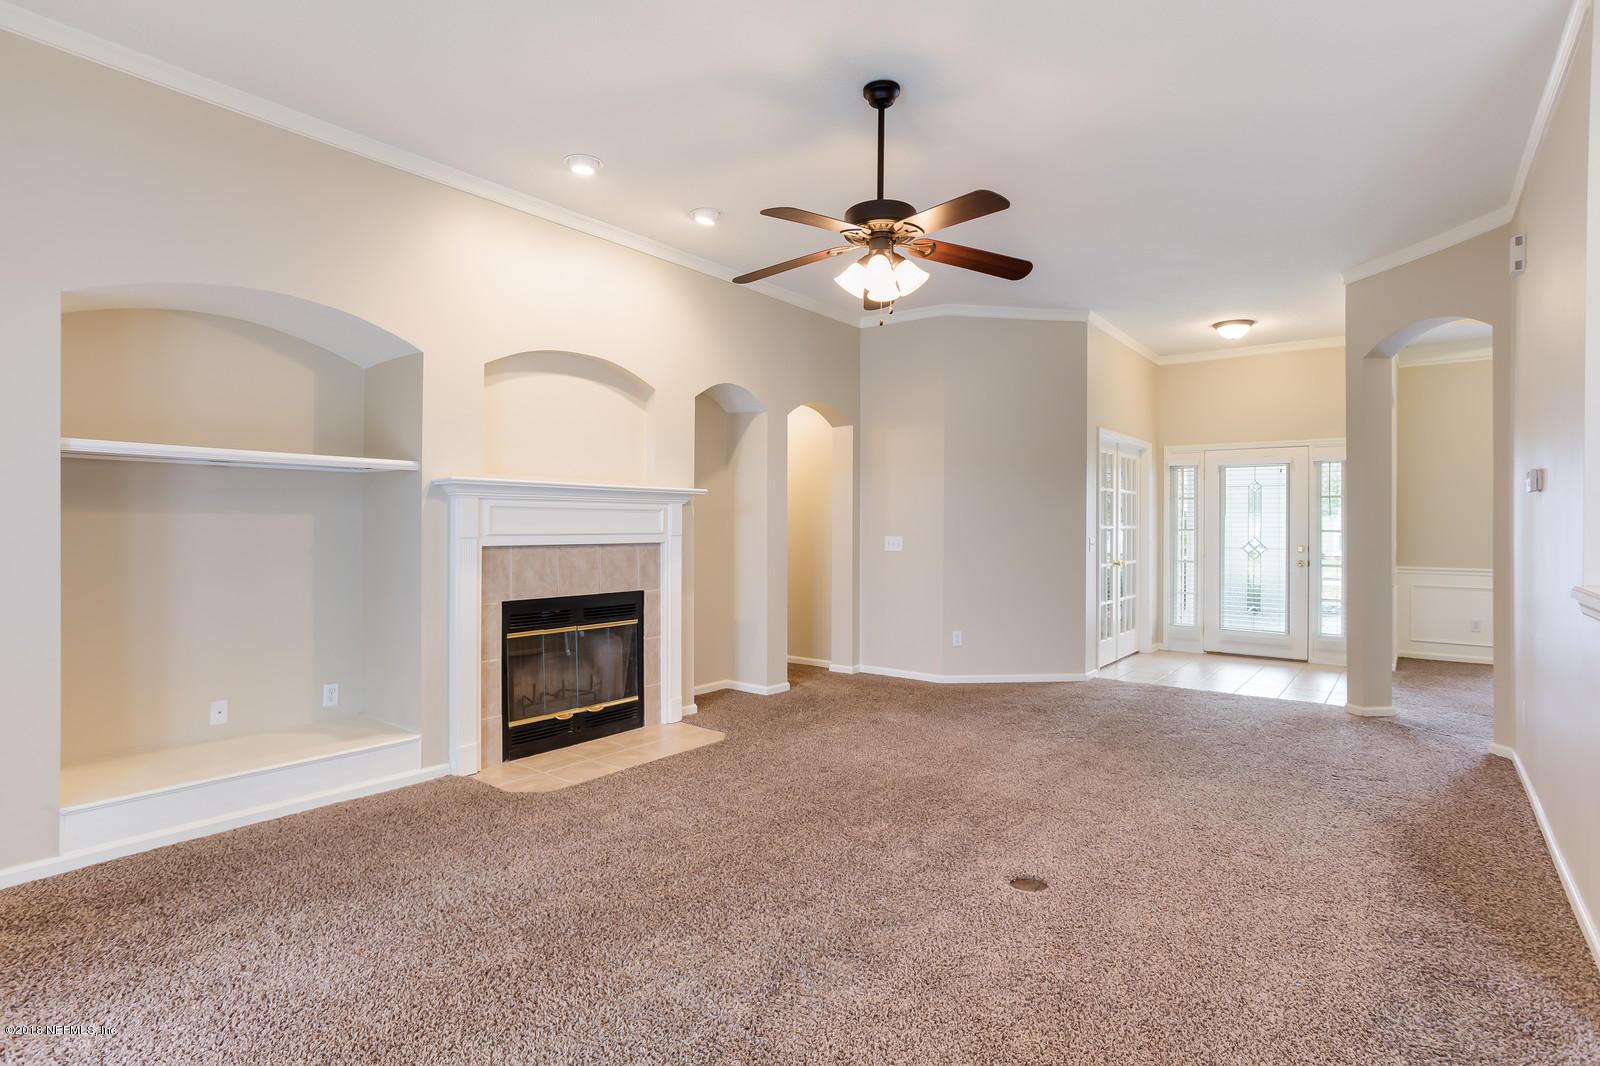 2272 BROOK, ORANGE PARK, FLORIDA 32003, 5 Bedrooms Bedrooms, ,4 BathroomsBathrooms,Residential - single family,For sale,BROOK,954438